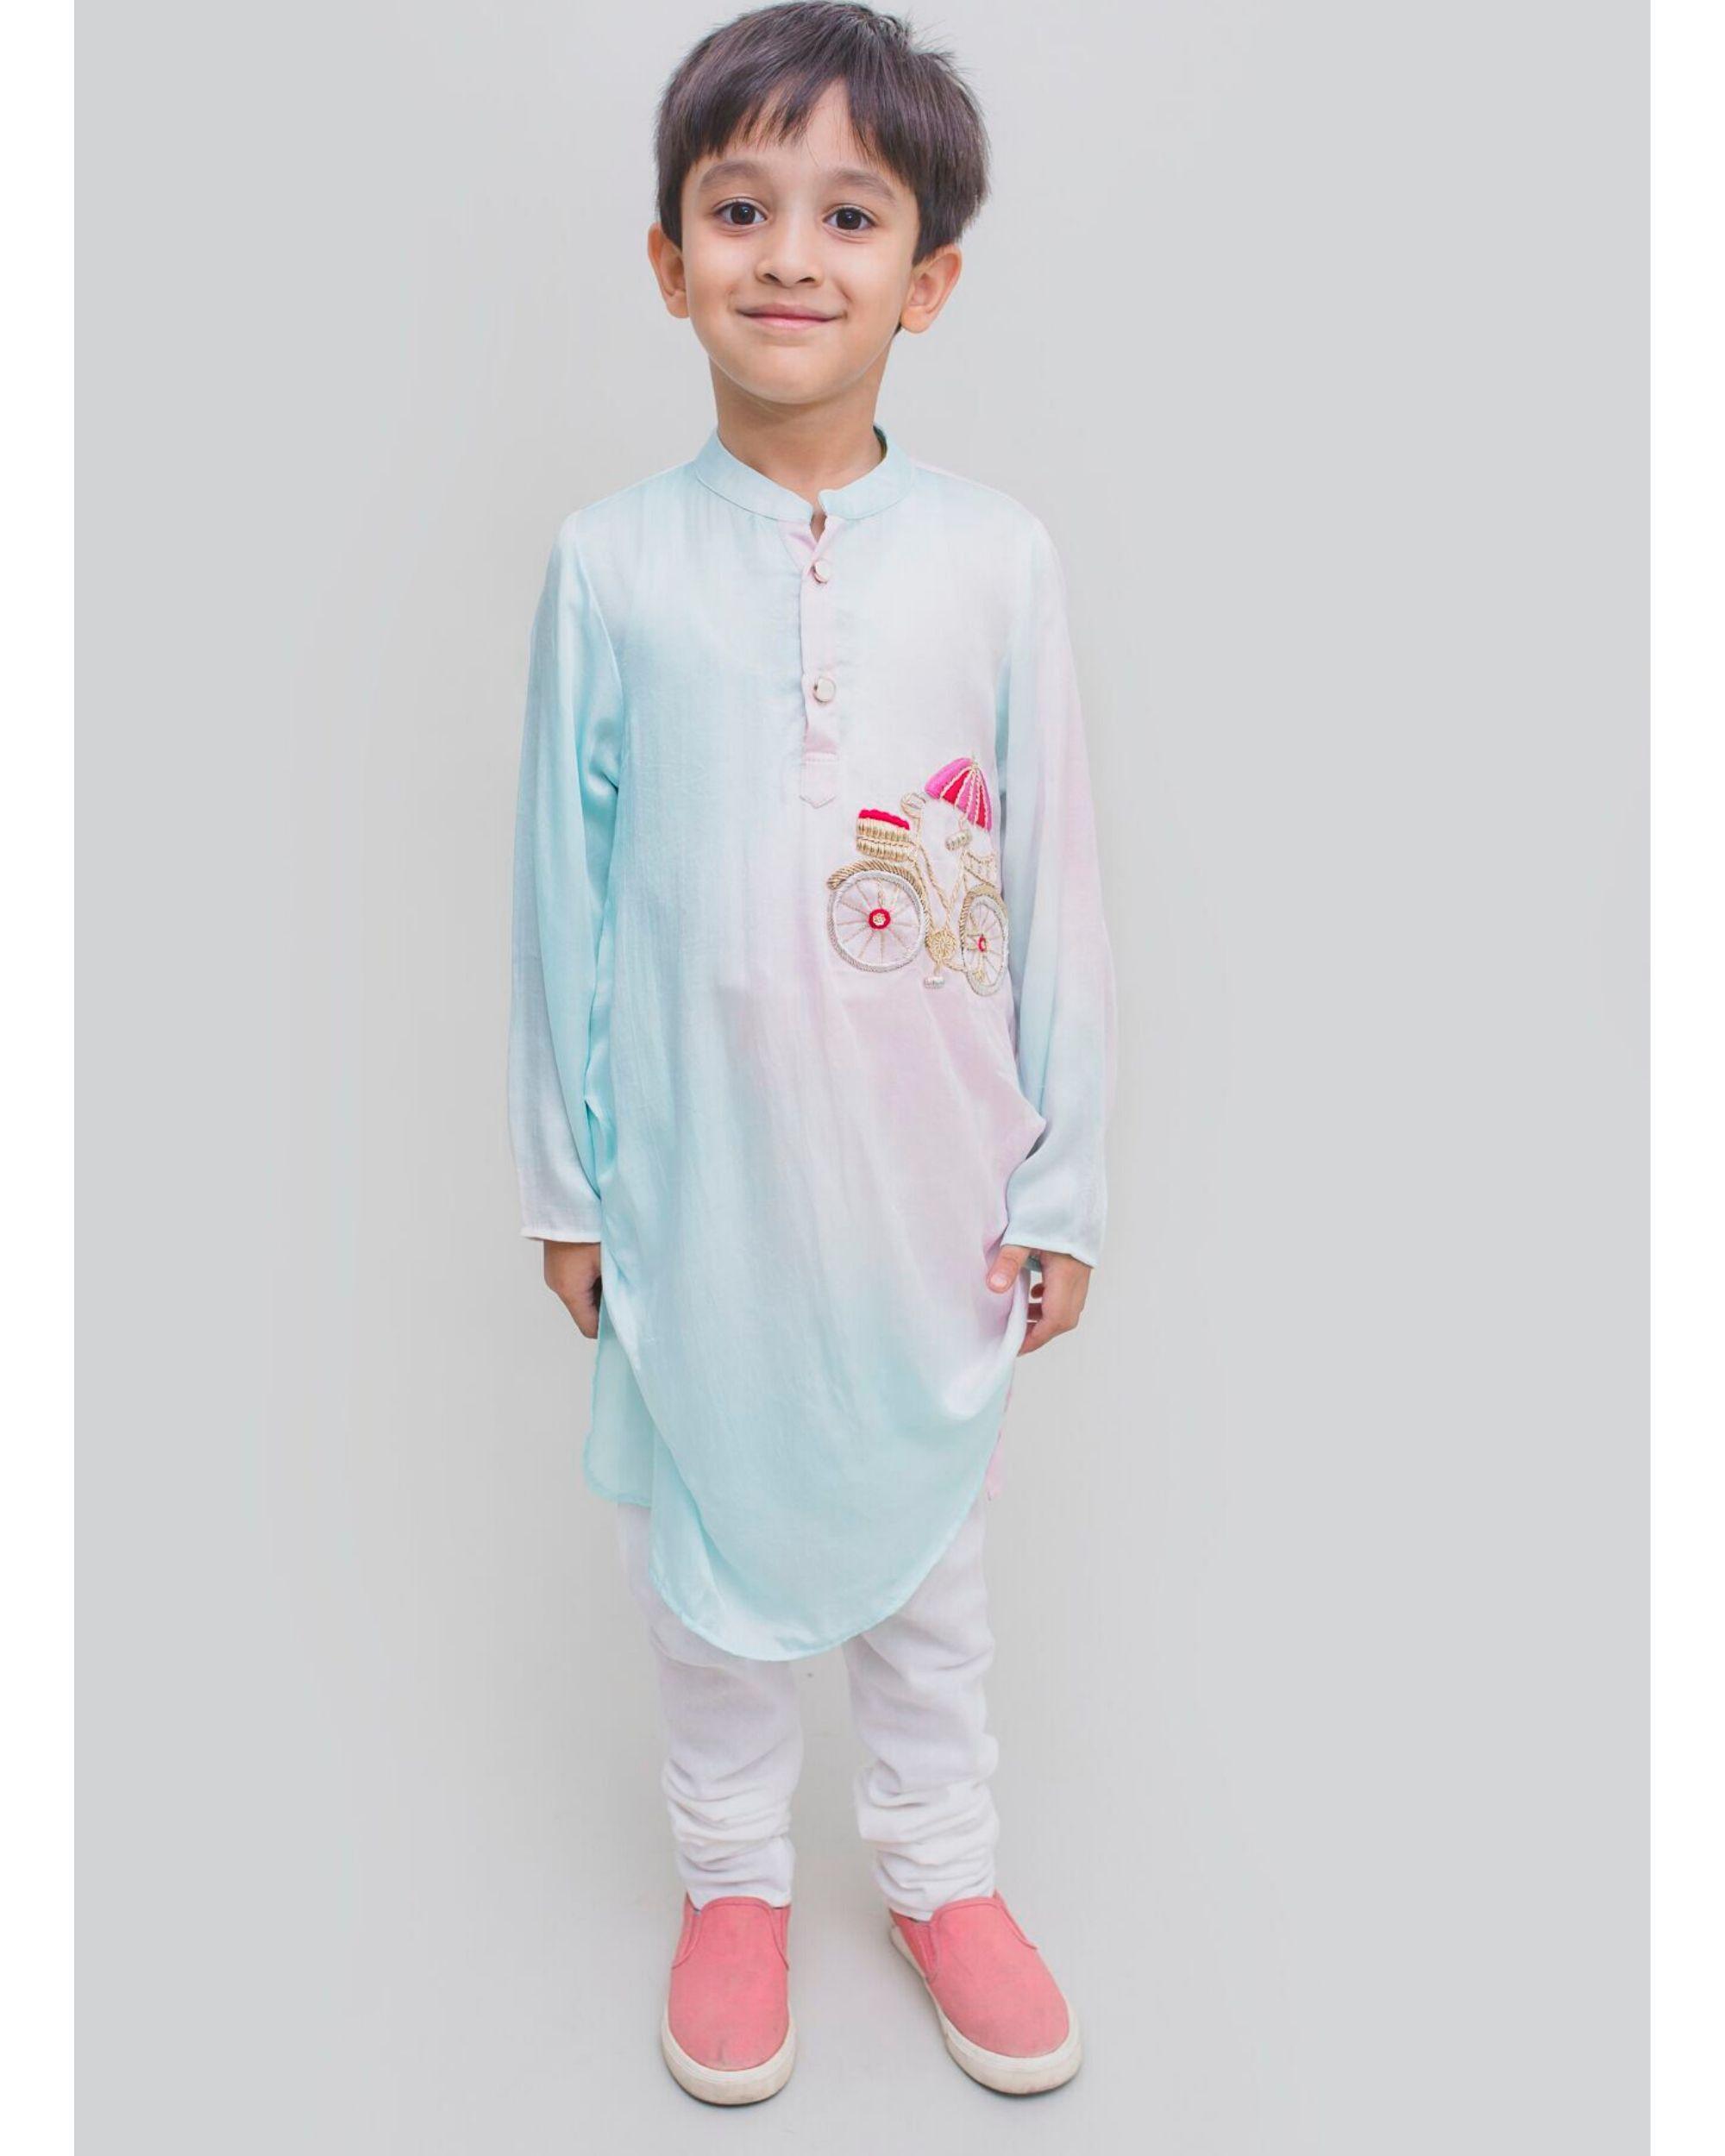 Light blue and pink bicycle embroidered kurta and Pyjama Set - Set Of Two